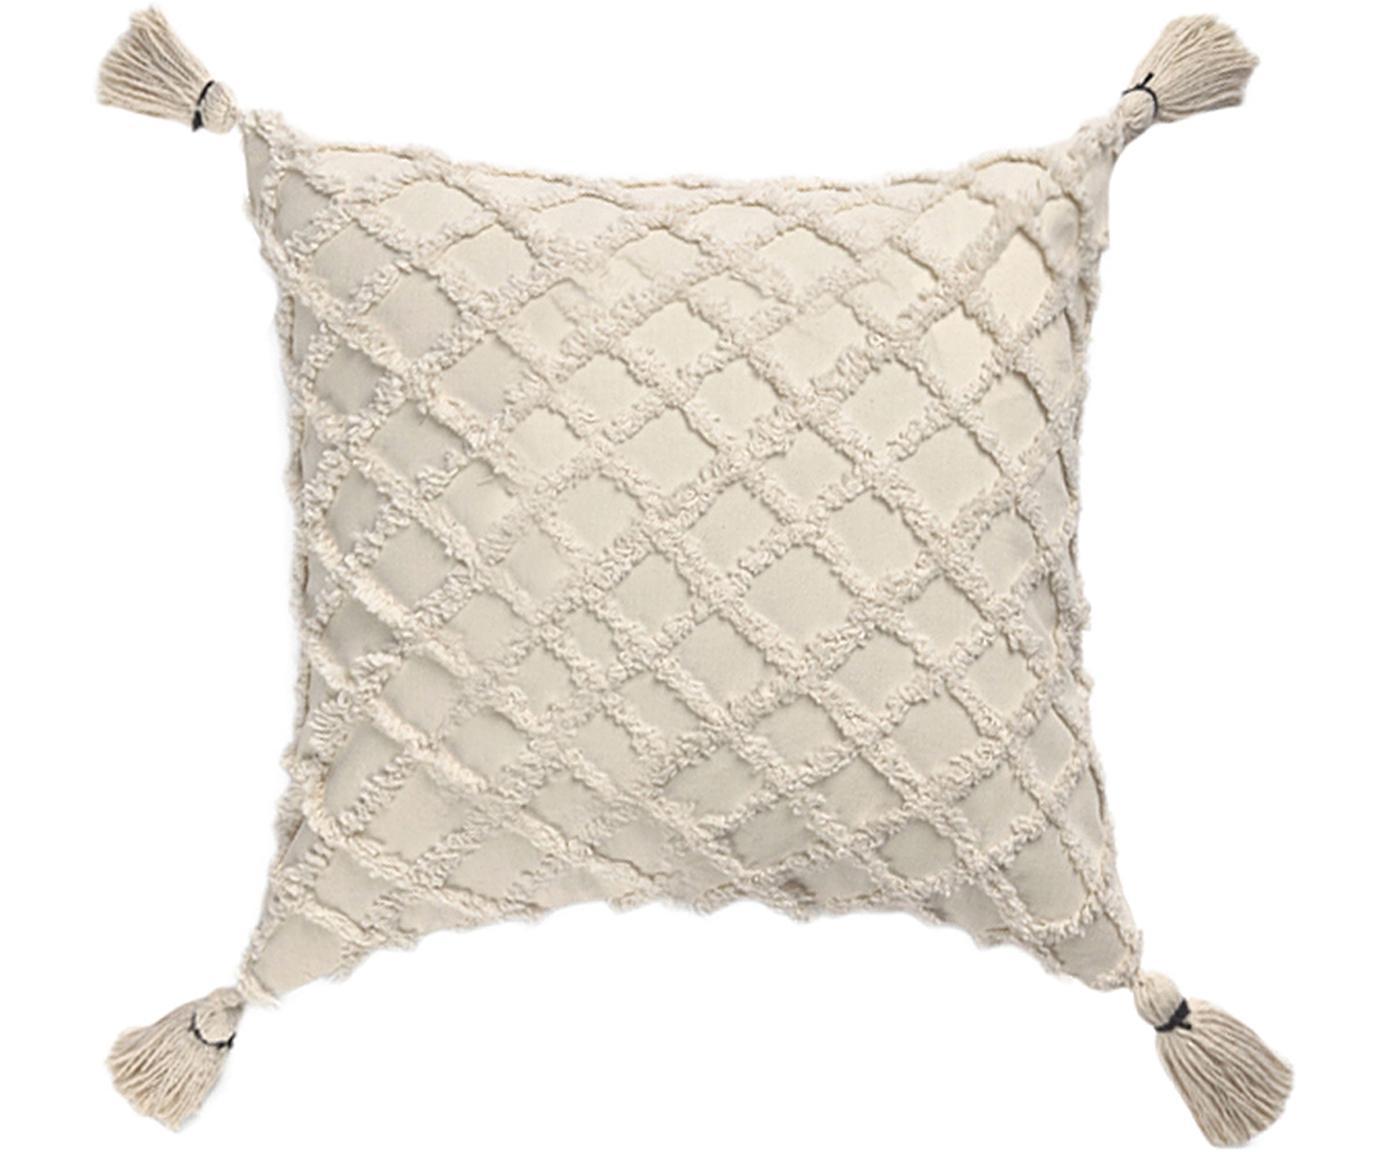 Federa arredo con motivo a rilievo Royal, Cotone, Bianco latteo, Larg. 45 x Lung. 45 cm